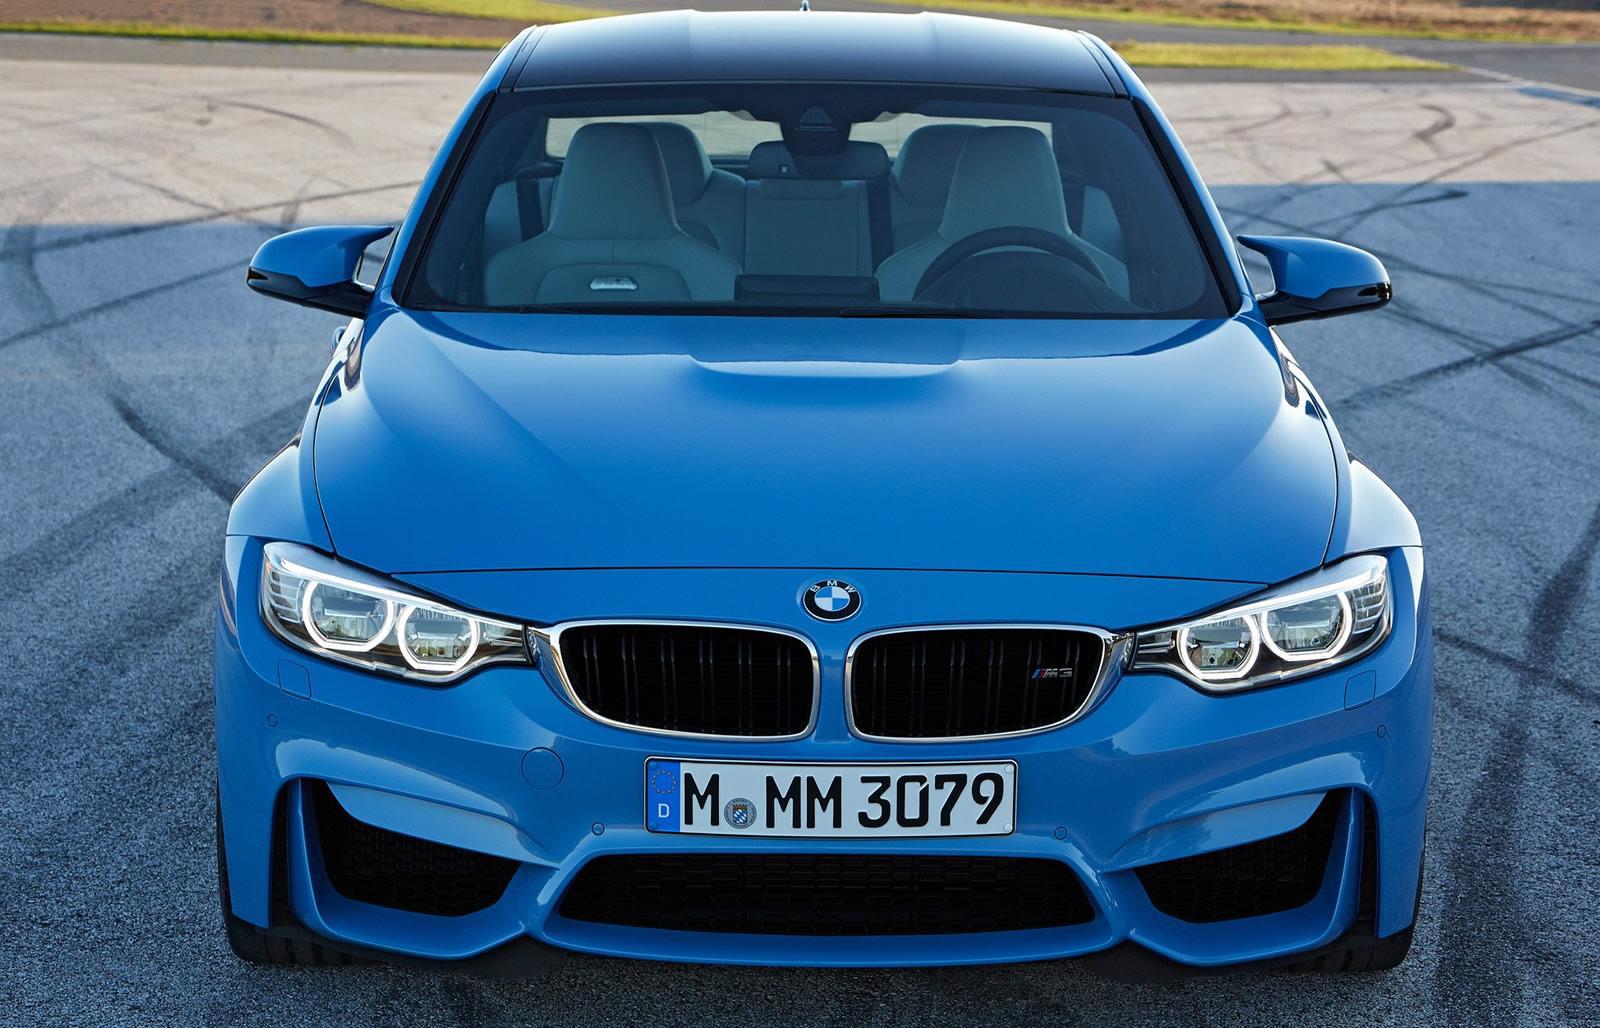 Foto de BMW M3 2014 (10/13)